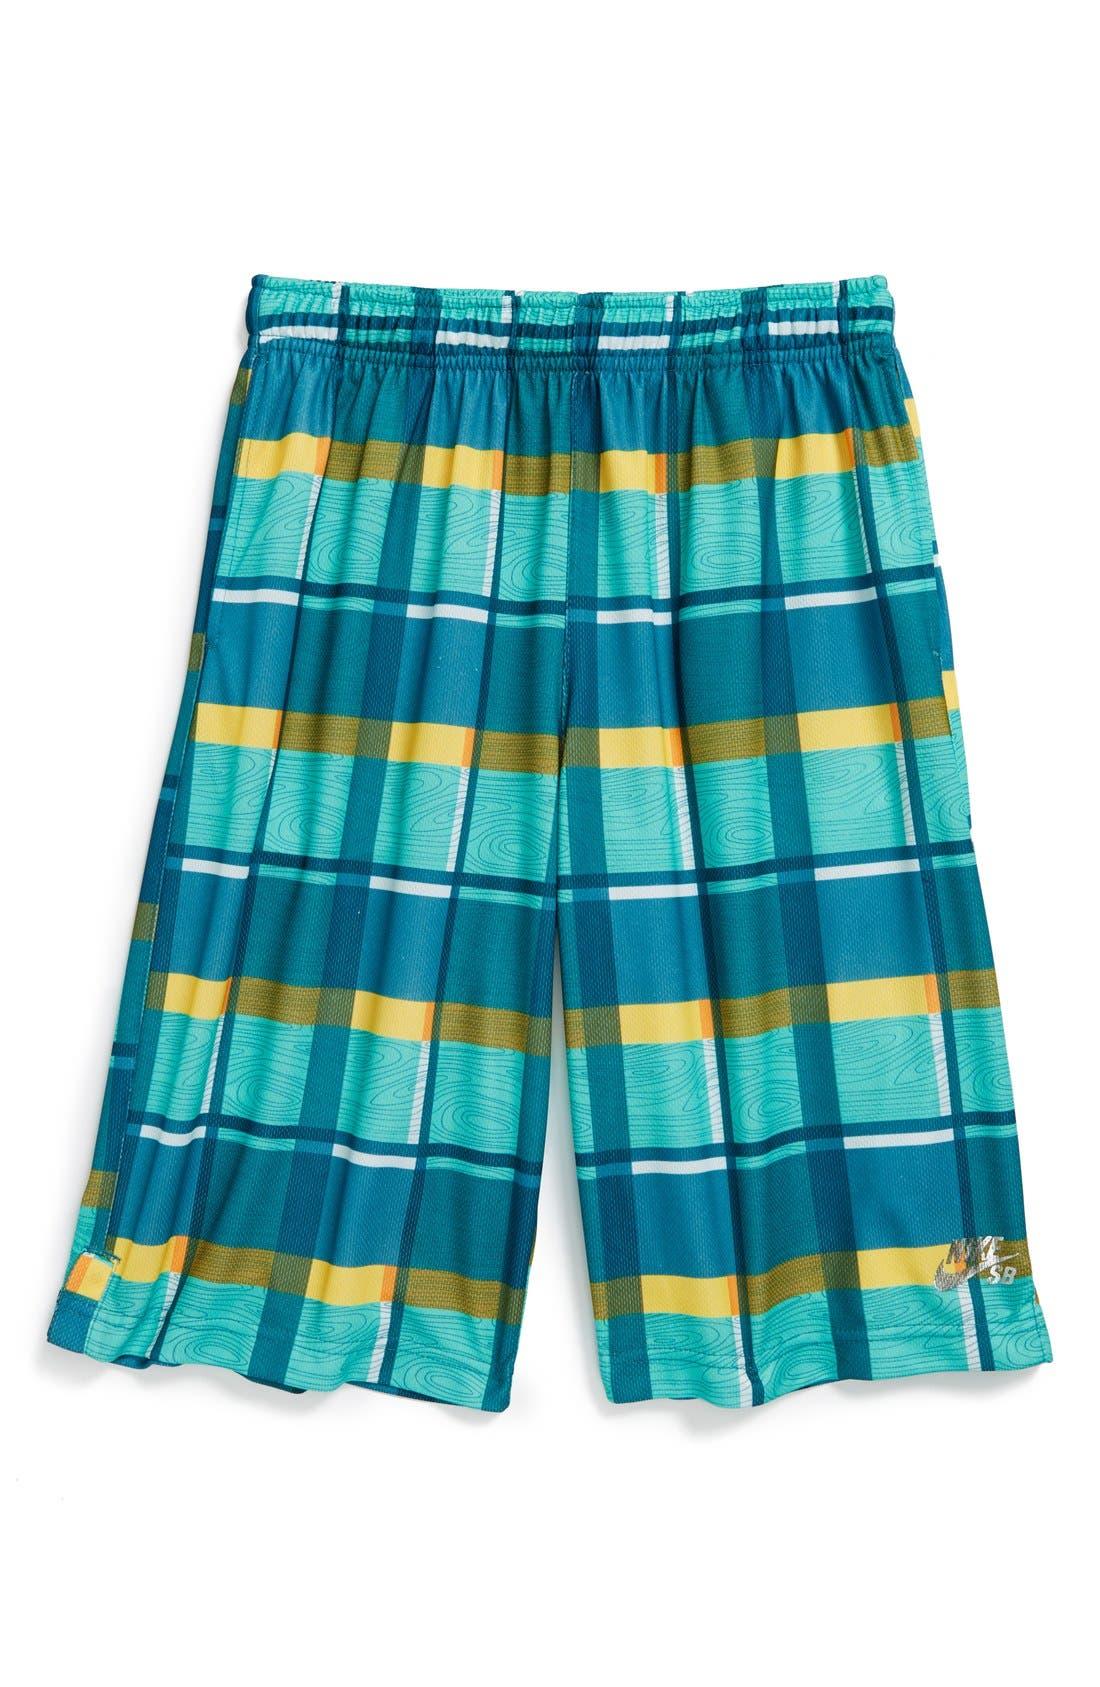 Alternate Image 1 Selected - Nike 'SB Woodgrain Plaid' Mesh Shorts (Big Boys)